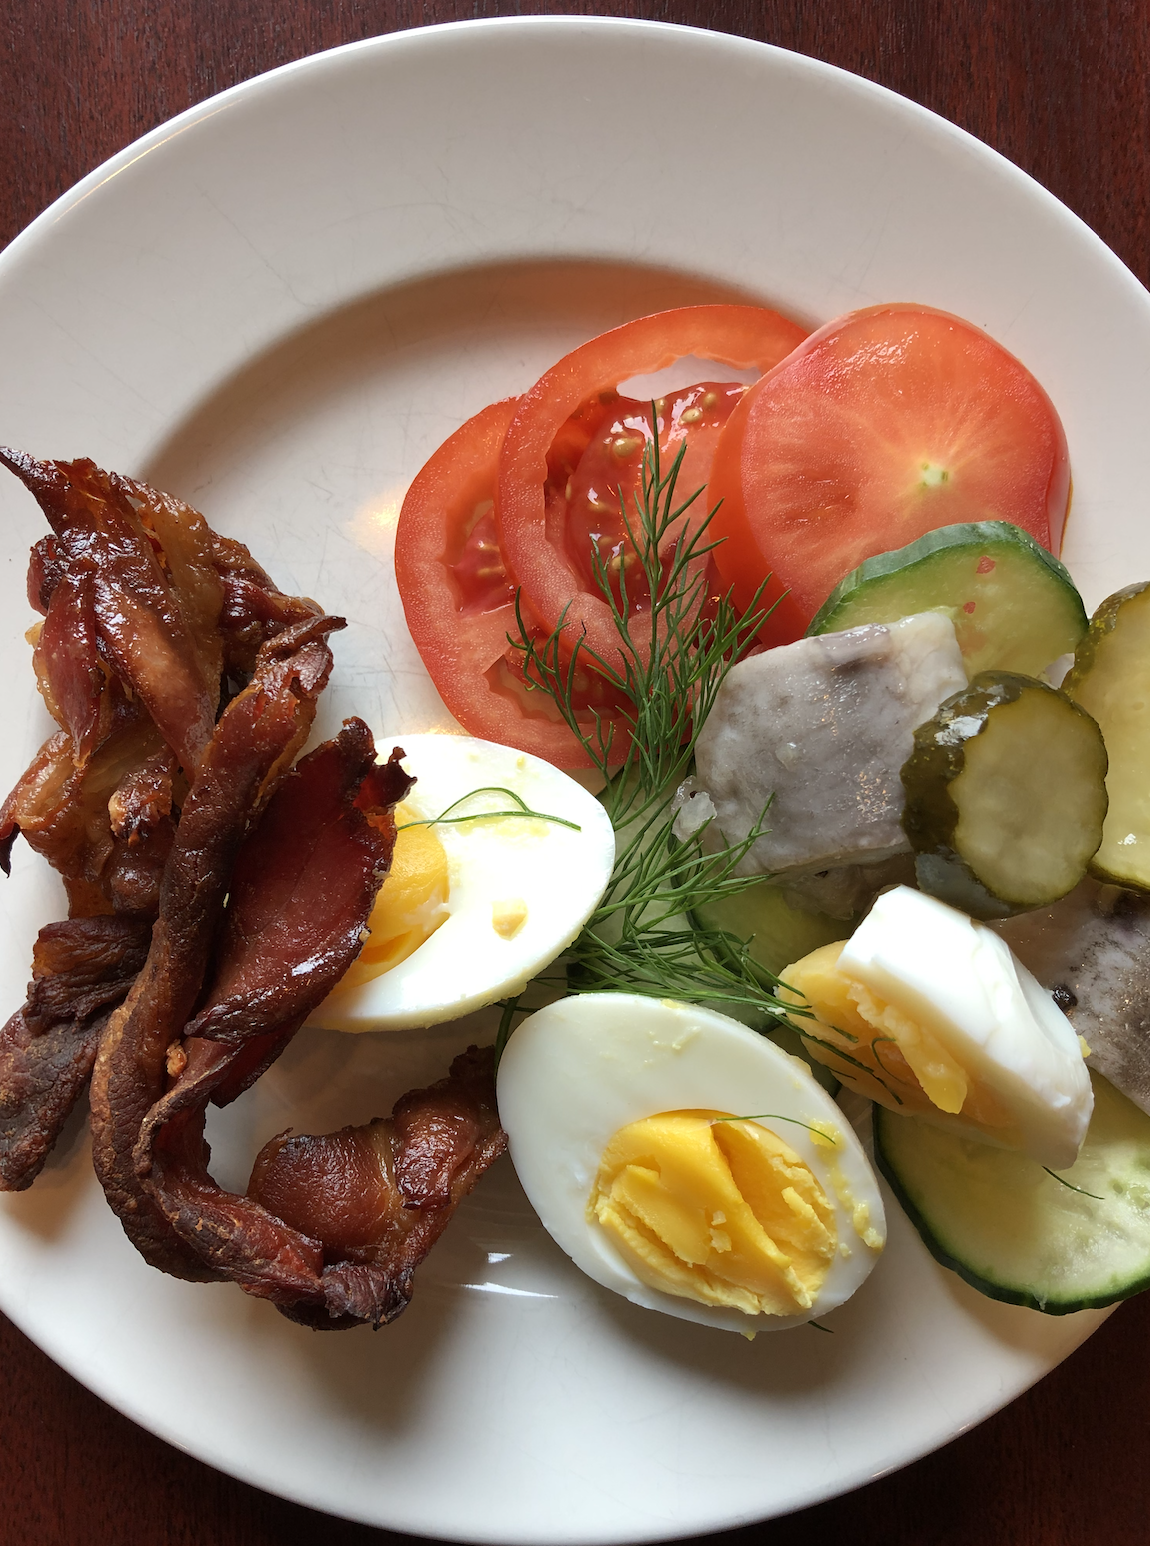 Swedish breakfast at First Hotel Carlshamn in Karlshamn, Sweden